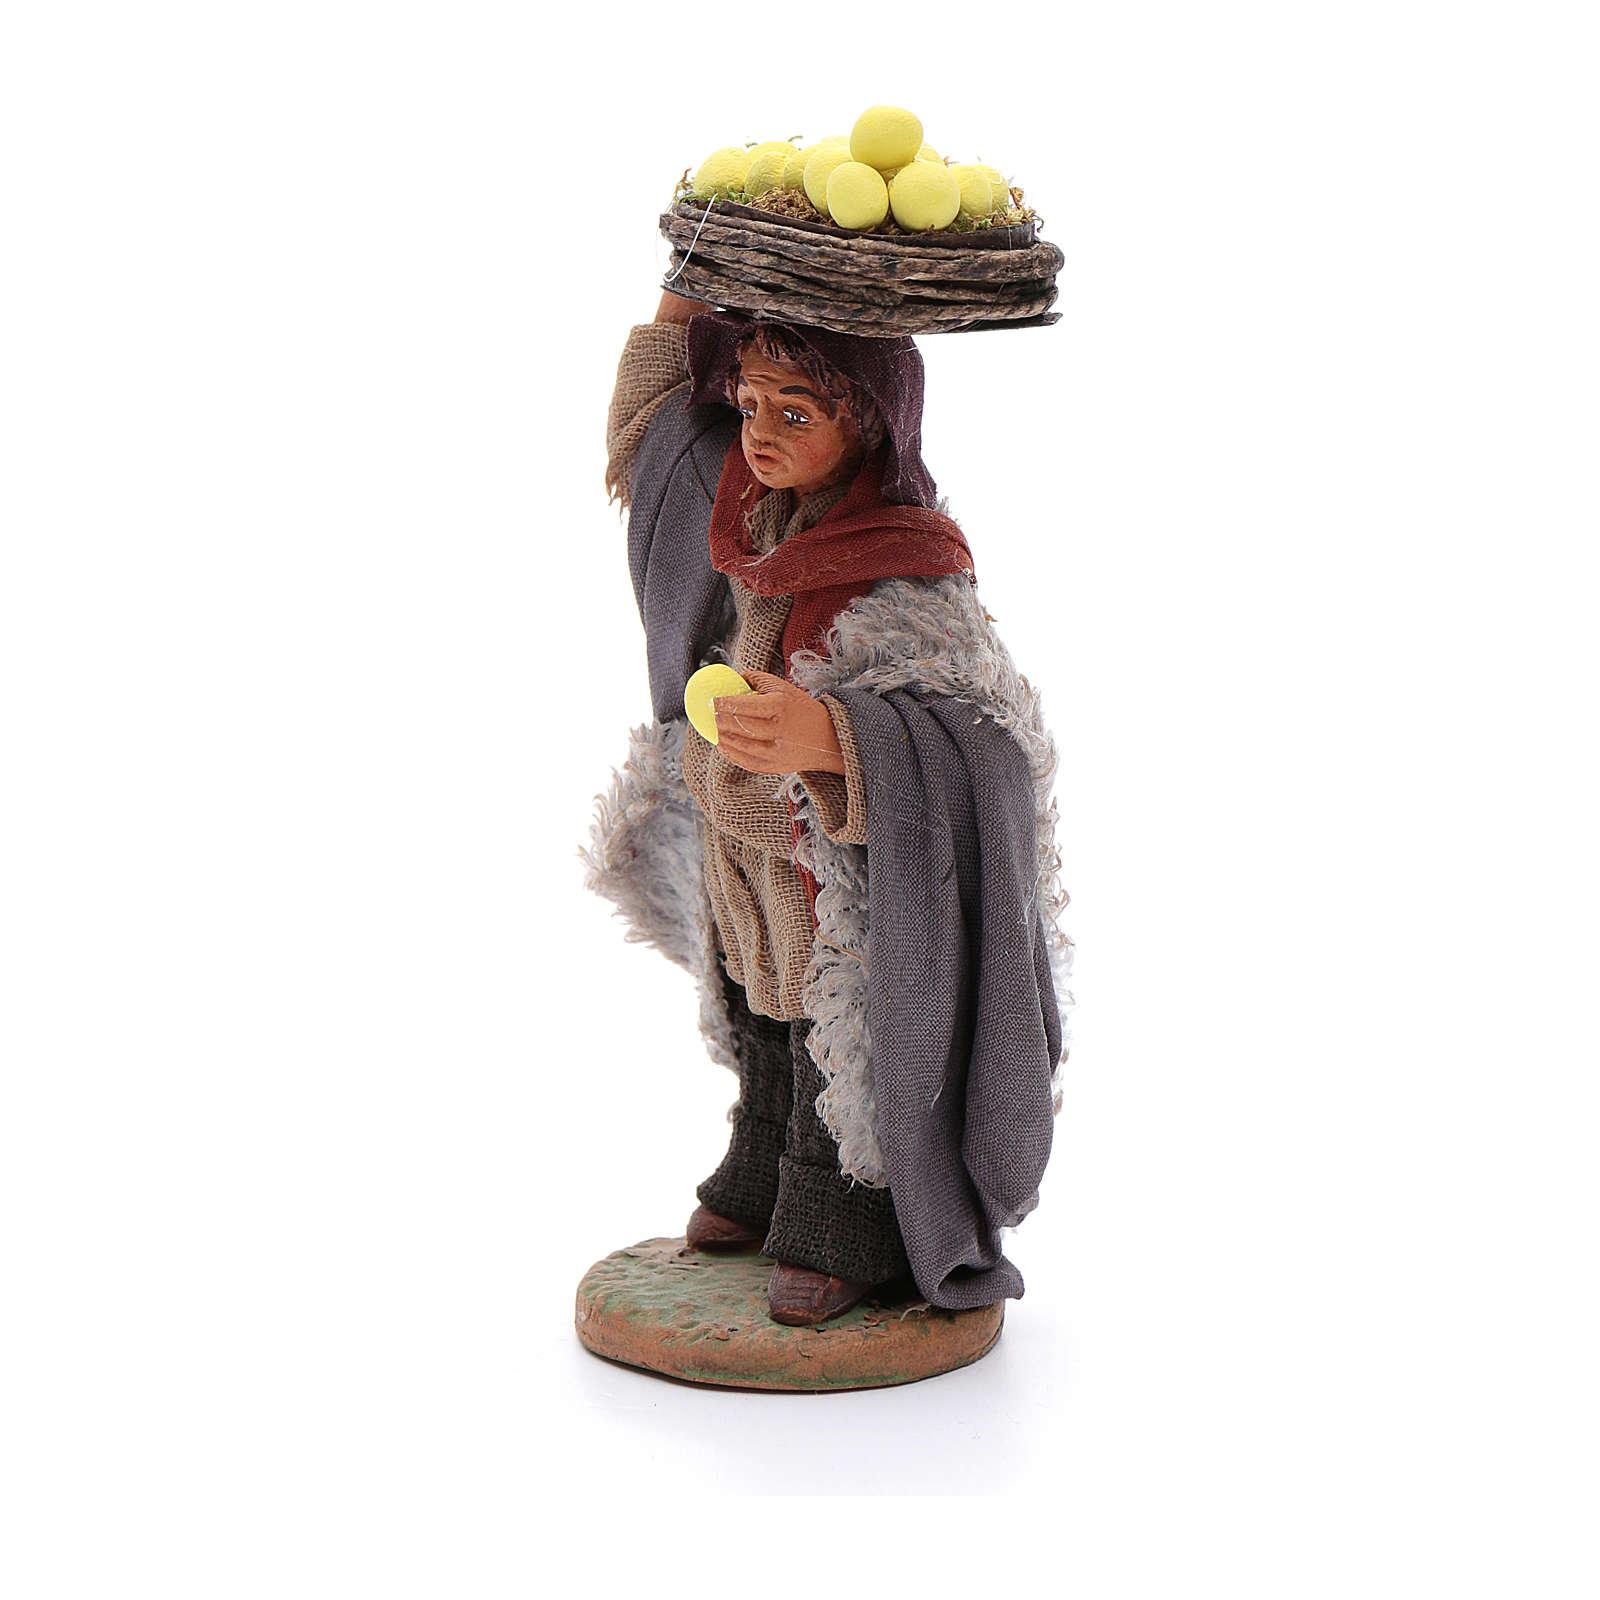 Man with lemon baskets, Neapolitan nativity figurine 10cm 4